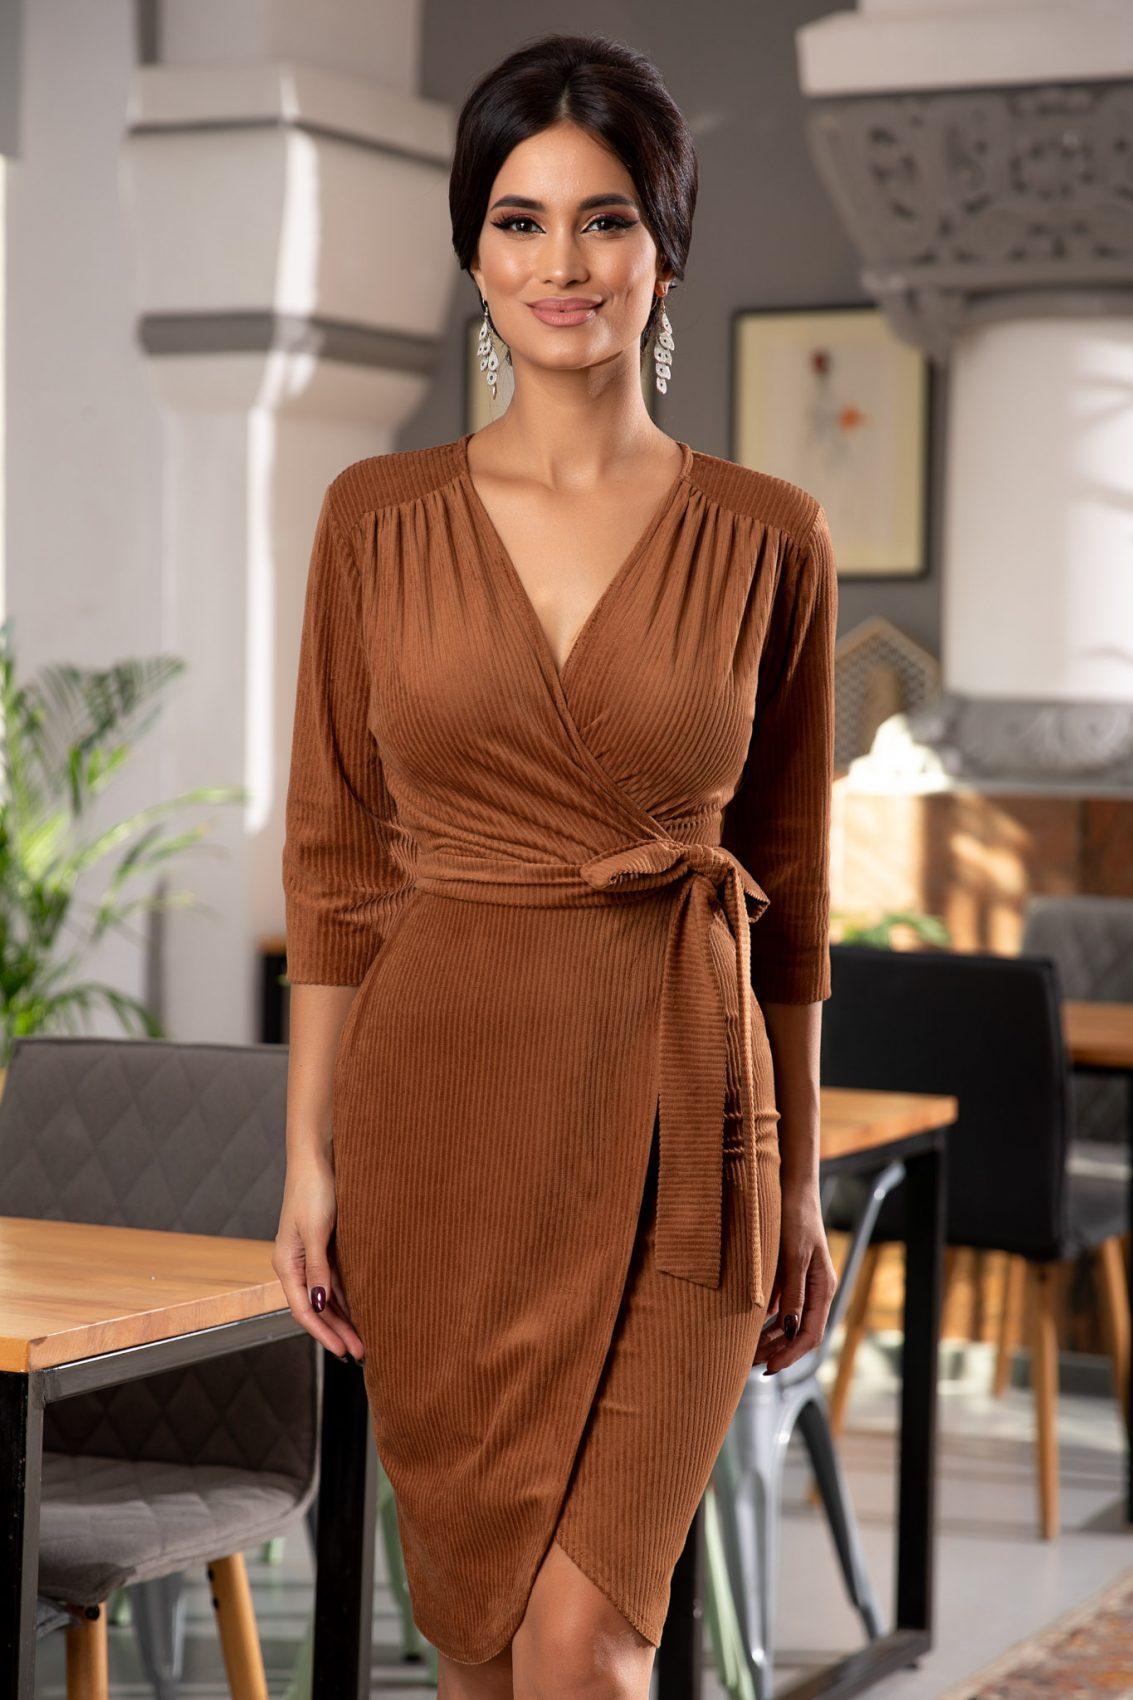 Jaqueline Caramel Dress